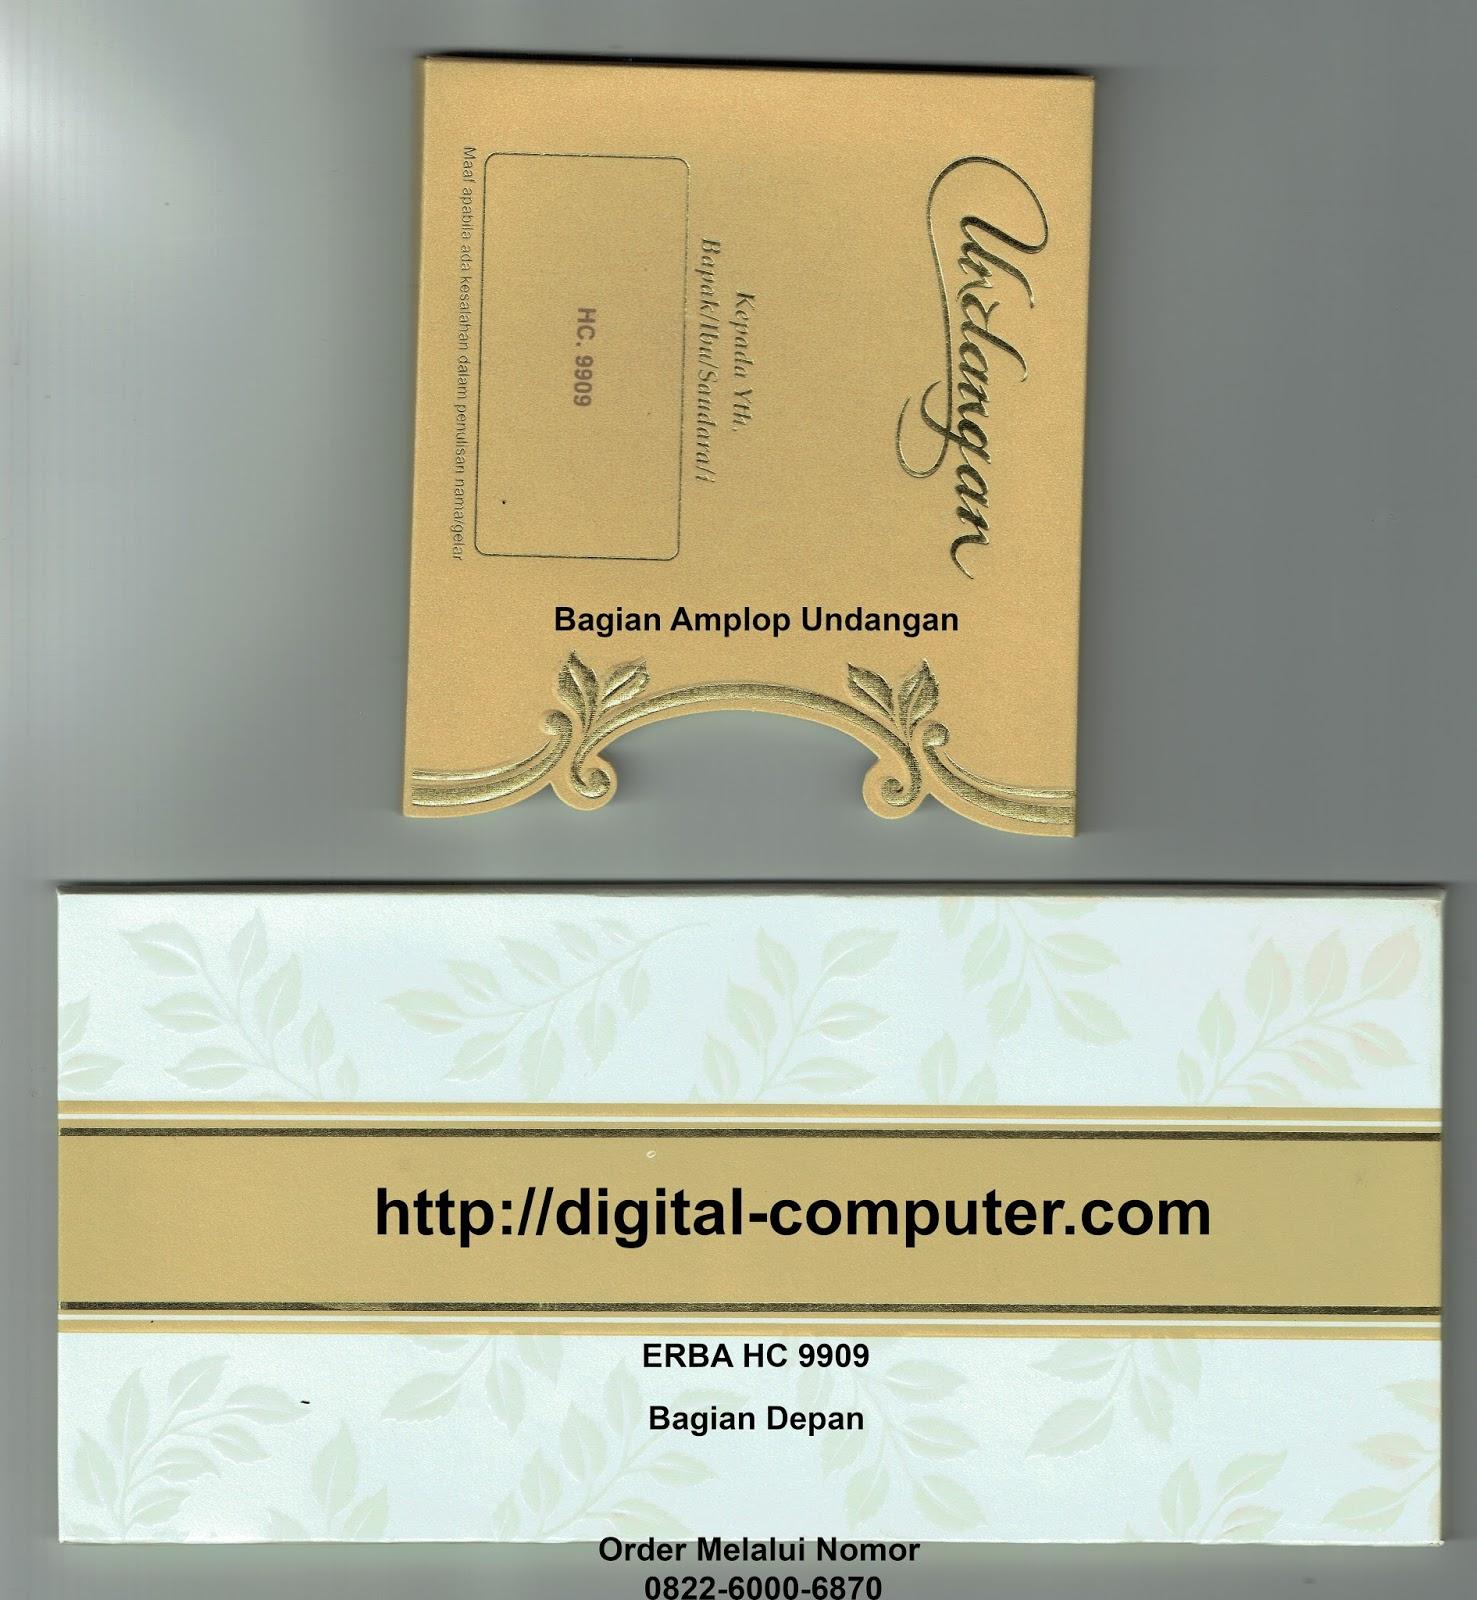 undangan hardcover ERBA HC-9909